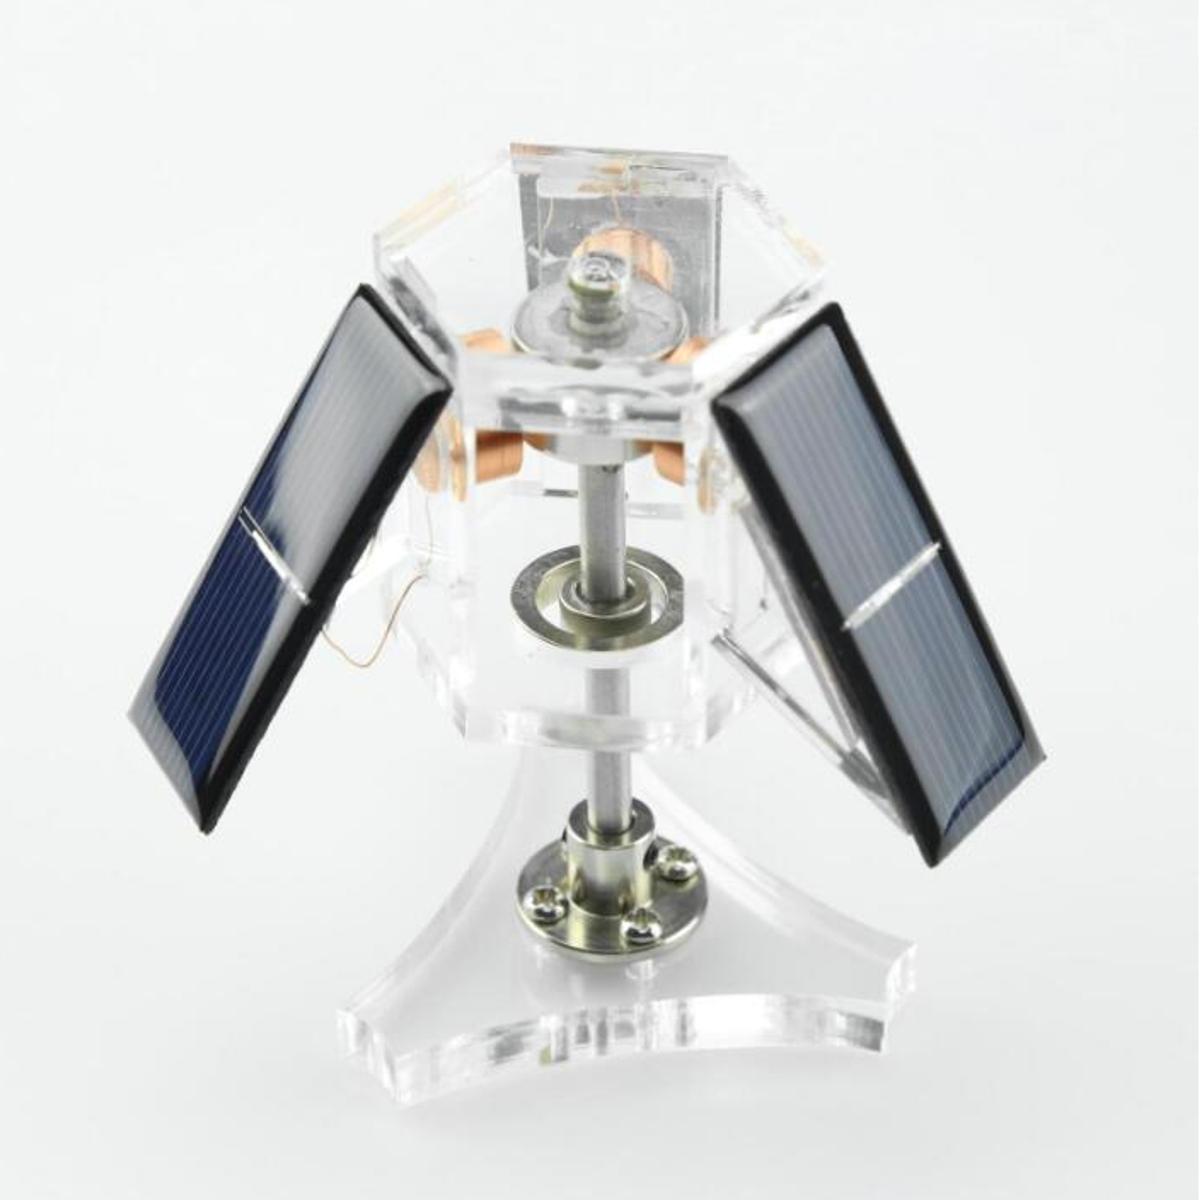 STARK-6 Solar Magnetic Levitation Mendocino Motor Education Model Steam Stirling Engine